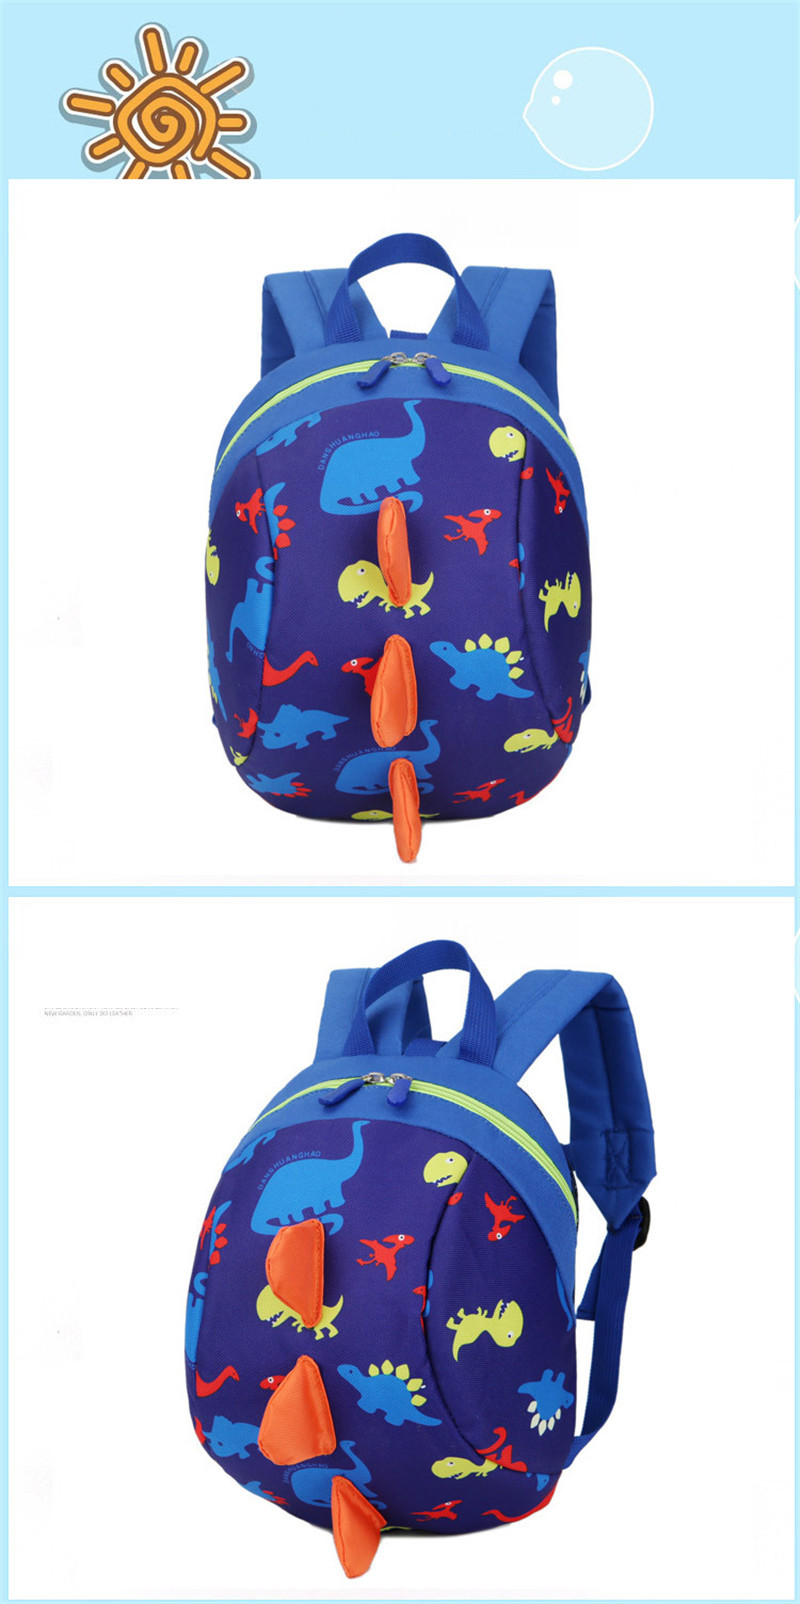 Style; In Responsible Customized Kids Baby School Bag Toddler Kindergarten Baby Boy Preschool Satchel Backpack Foot-ball Mochila Children Bookbag Fashionable